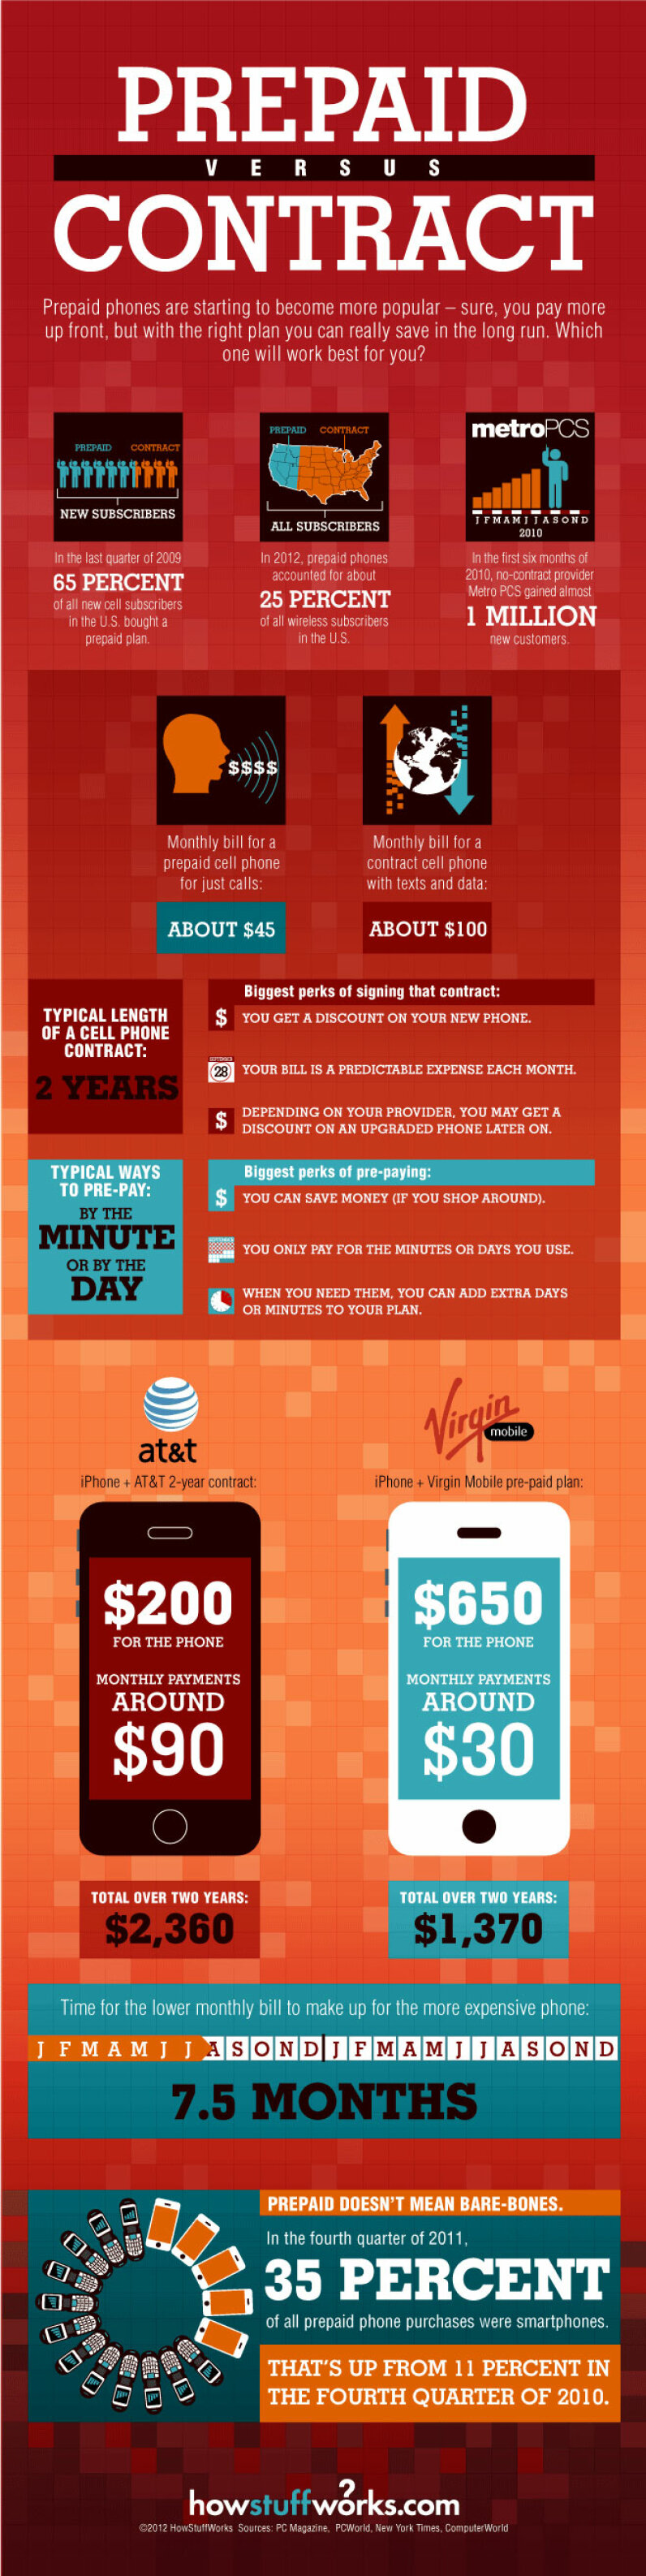 graph prepaid veresus contract phones